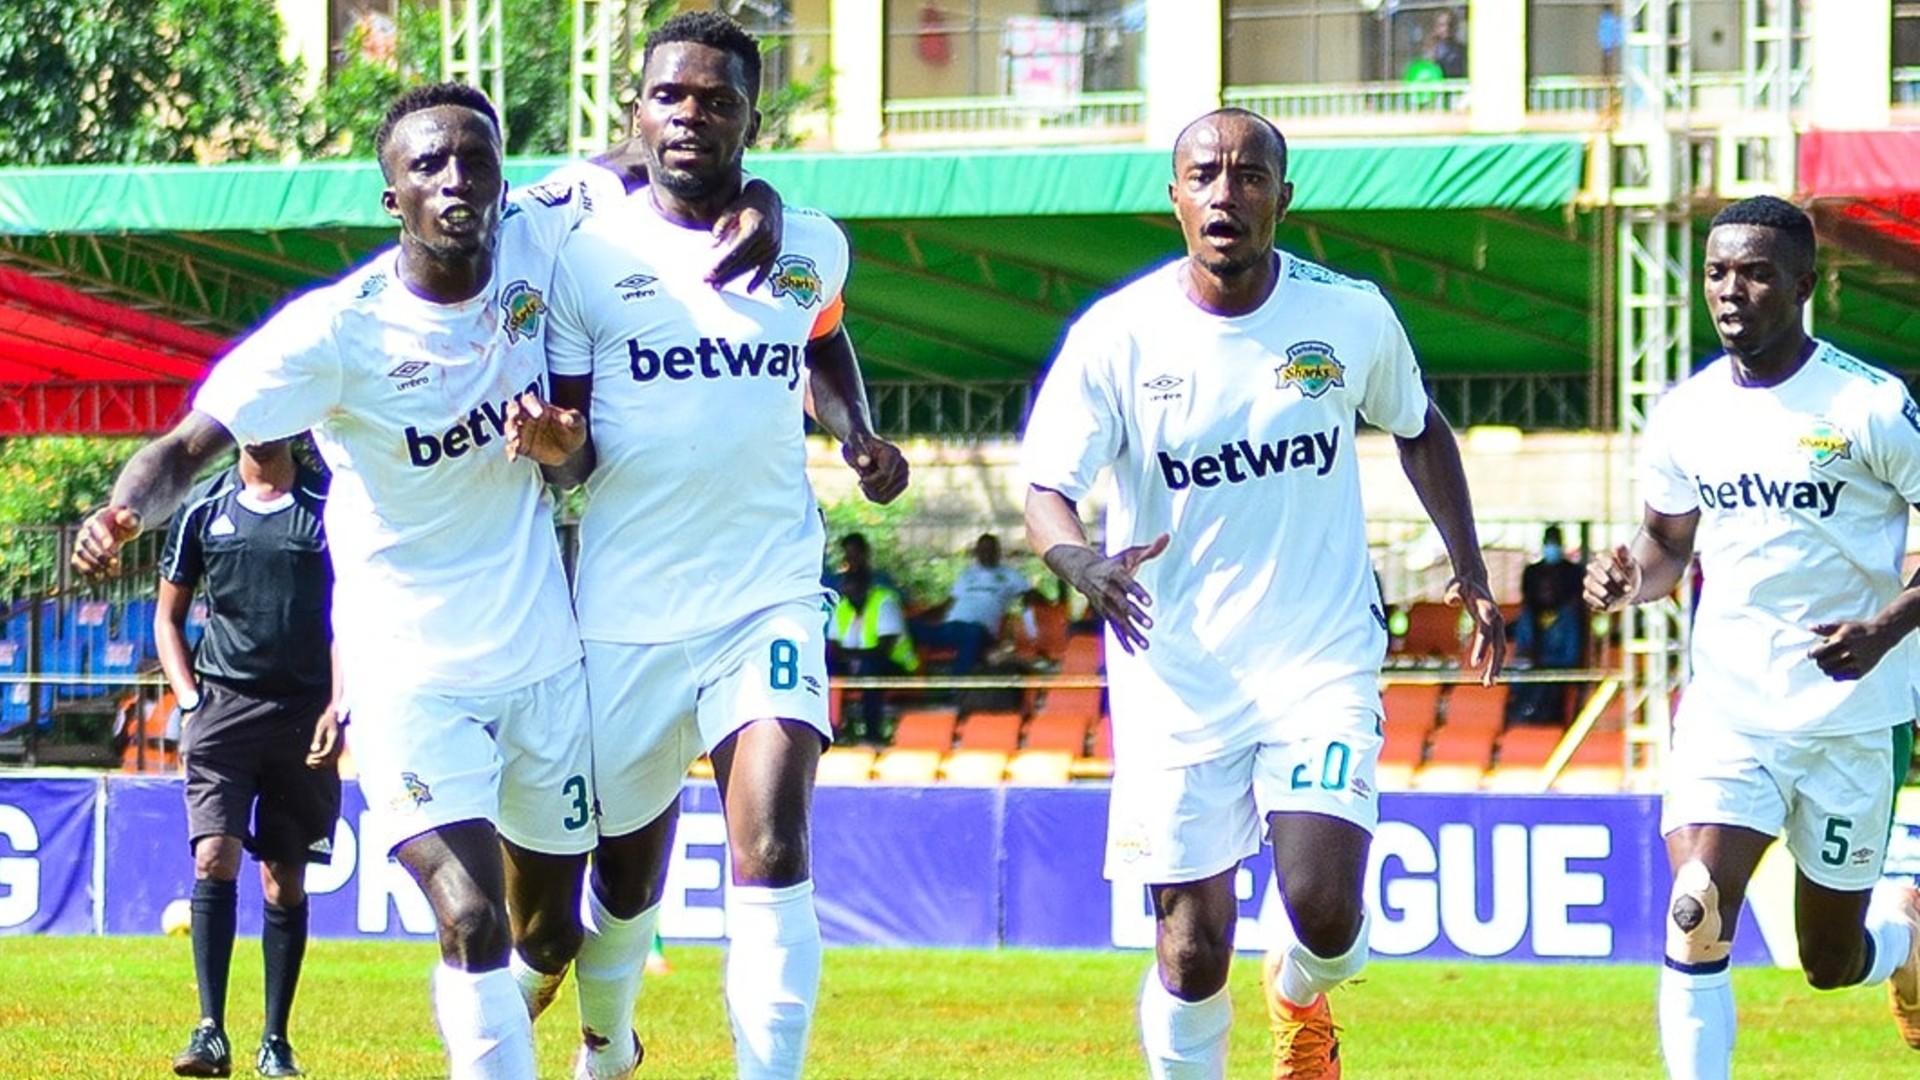 Ranking Kapaito and top five strikers in the 2020/21 FKF Premier League season